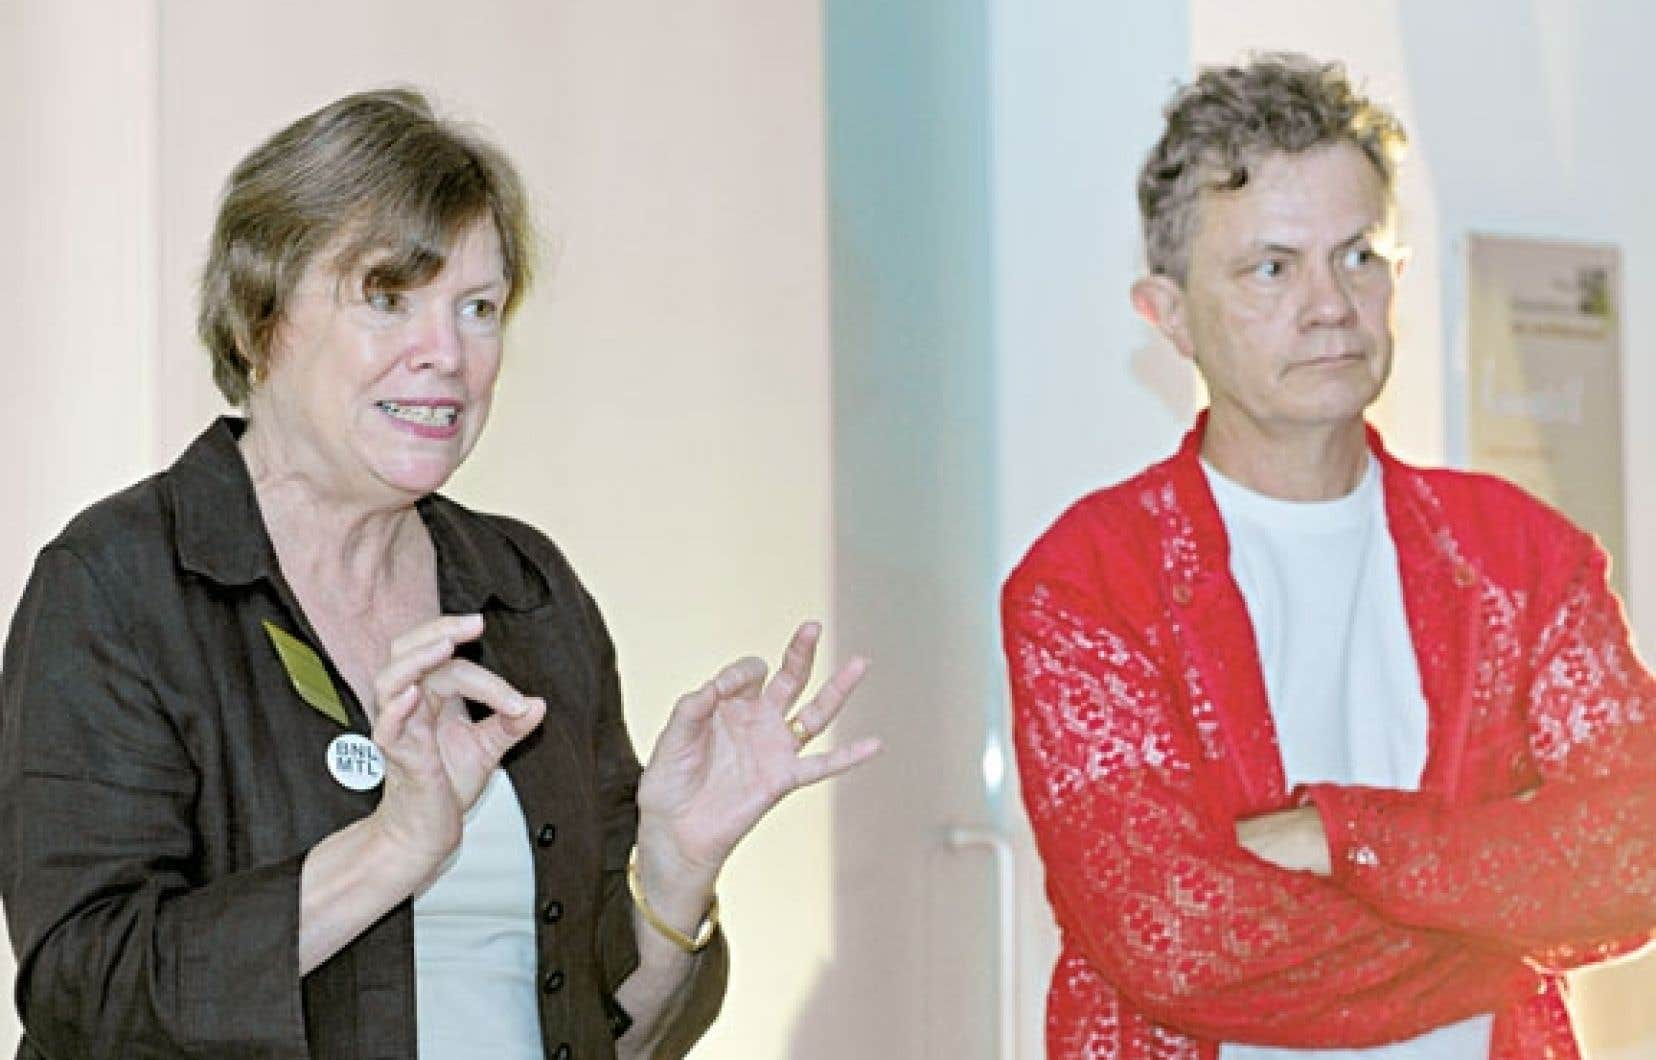 Les cocommissaires Peggy Gale et Gregory Burke